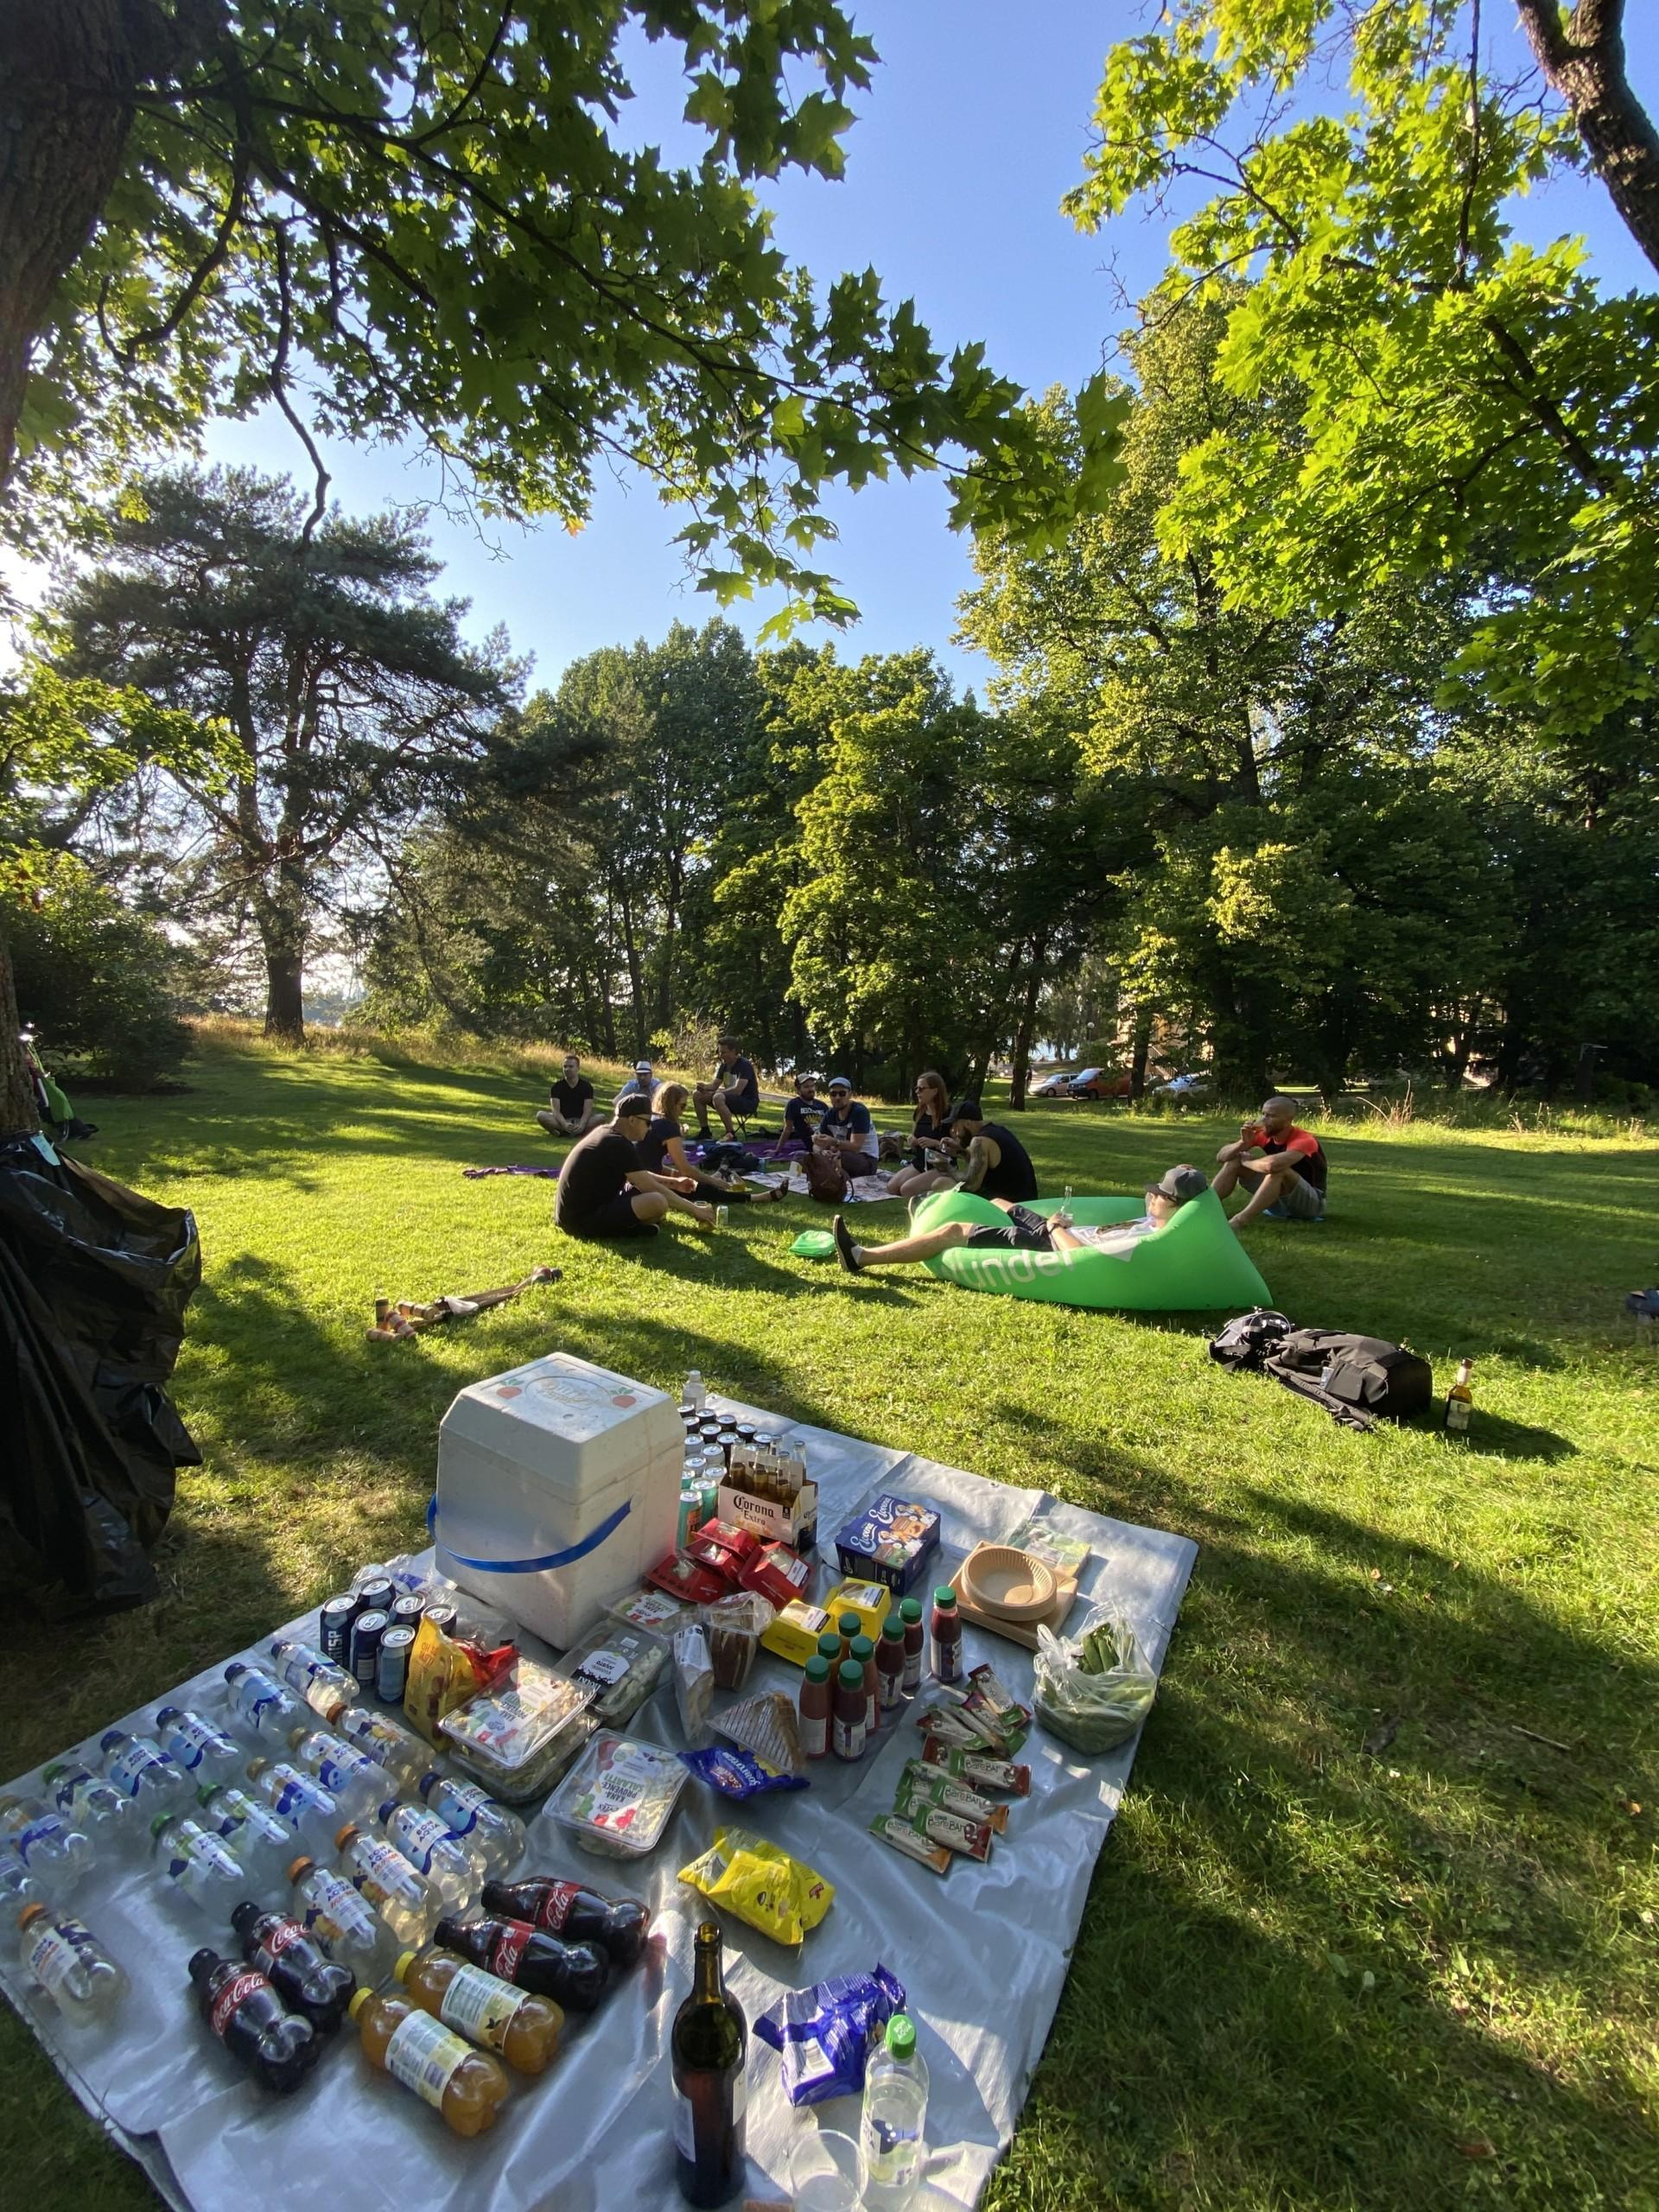 Helsinki office people enjoying a nice picnic in the park